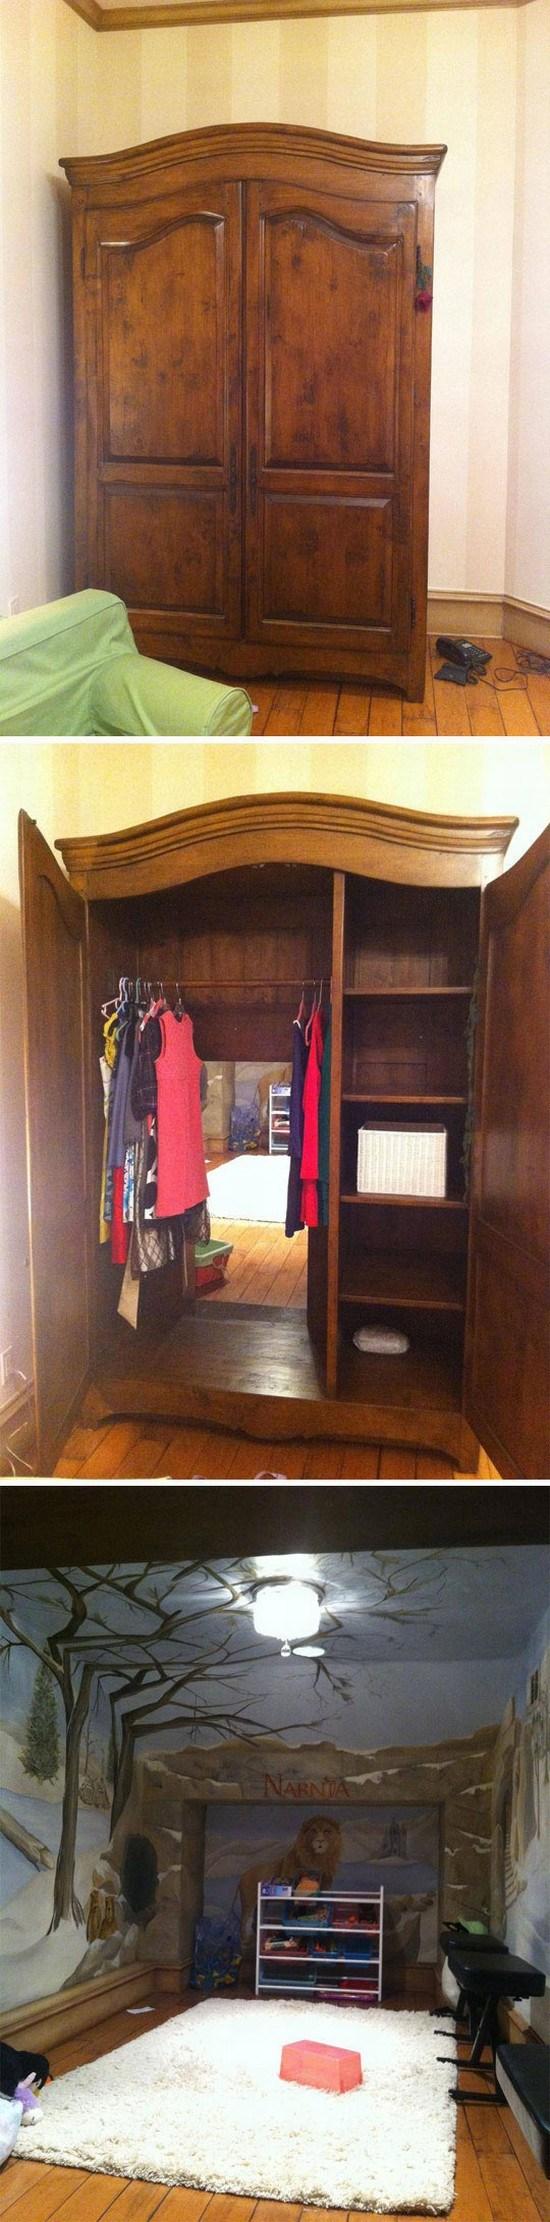 narnia-wardrobe-1